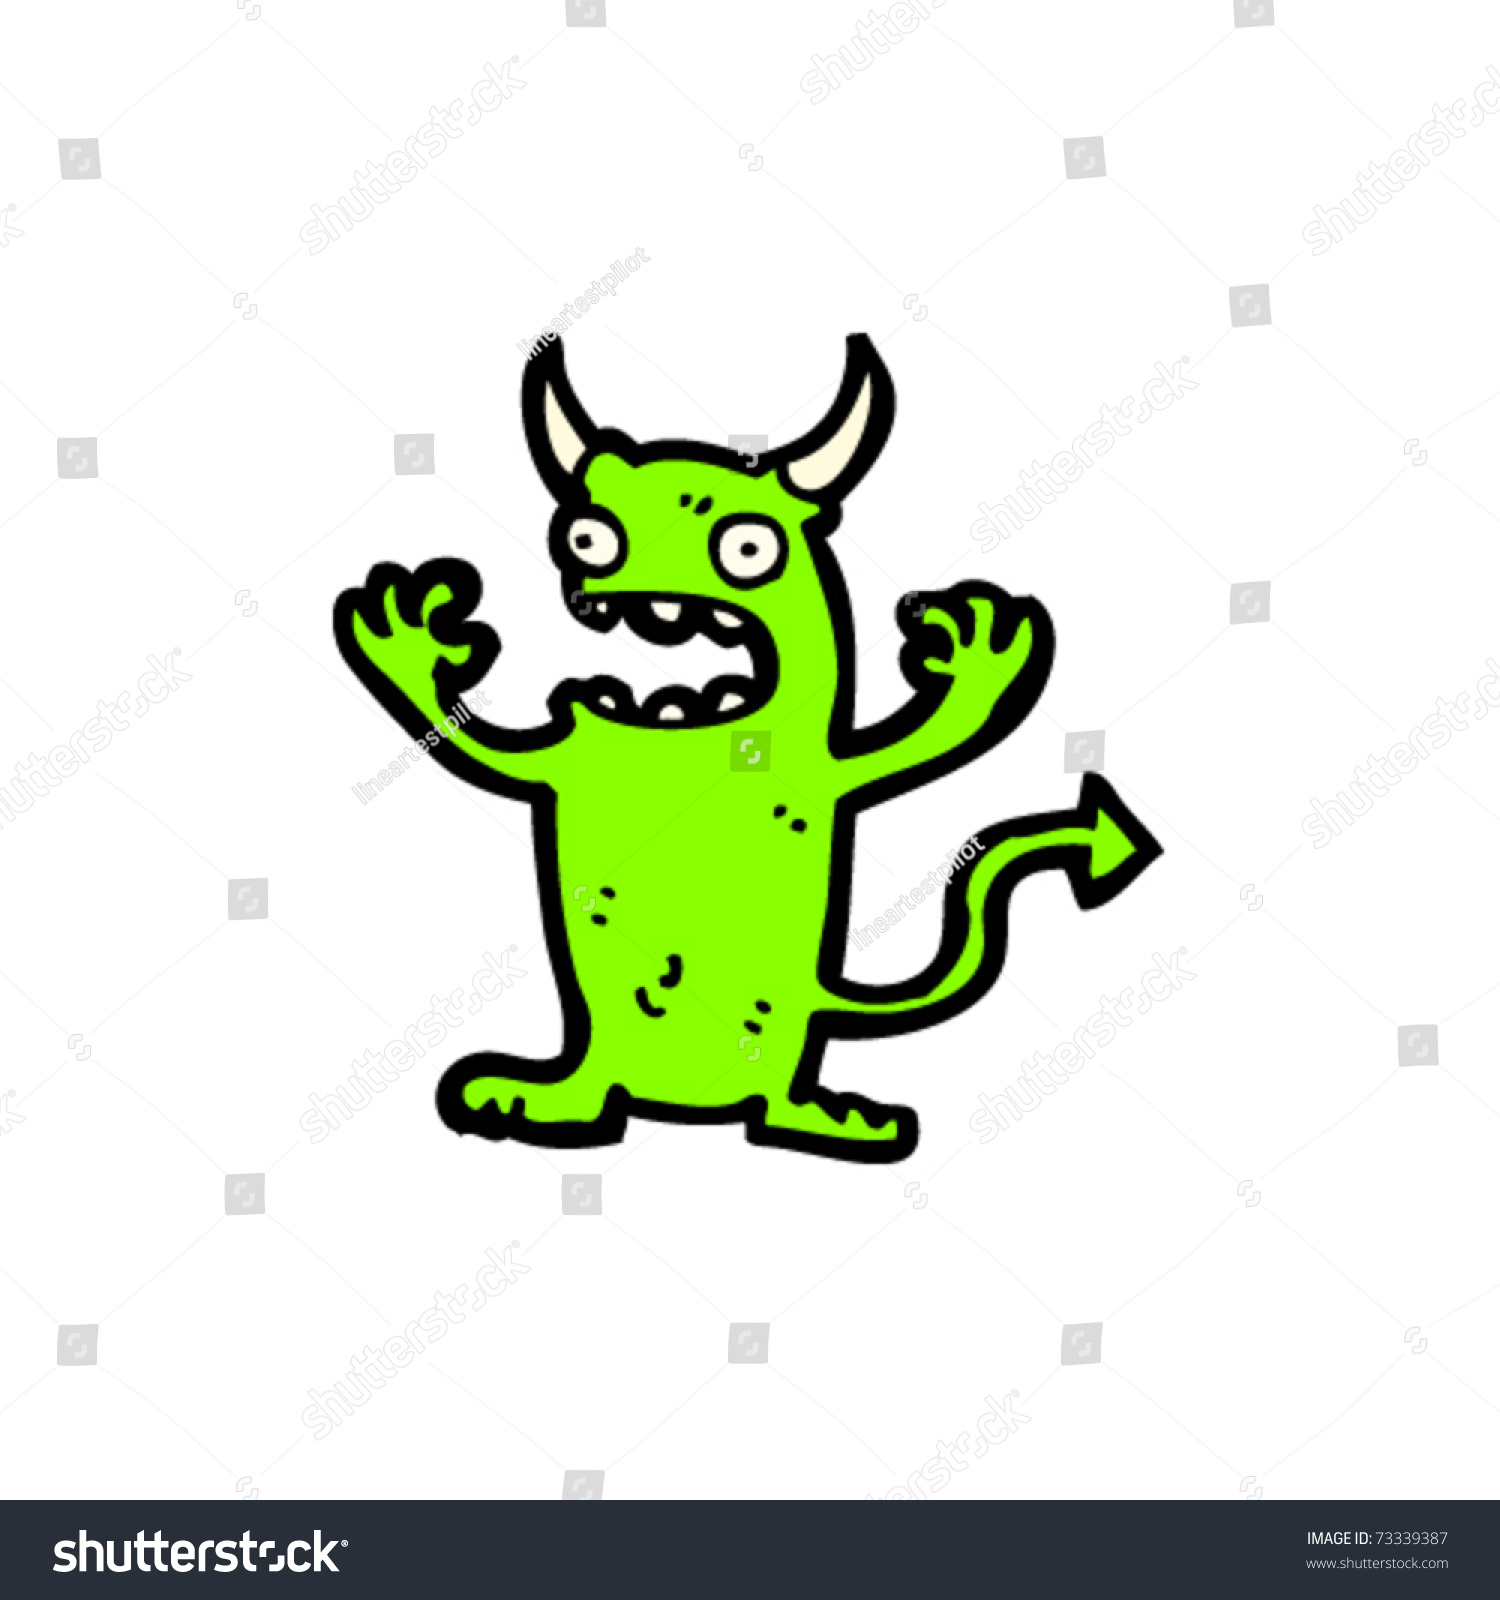 little green devil cartoon stock vector illustration. Black Bedroom Furniture Sets. Home Design Ideas